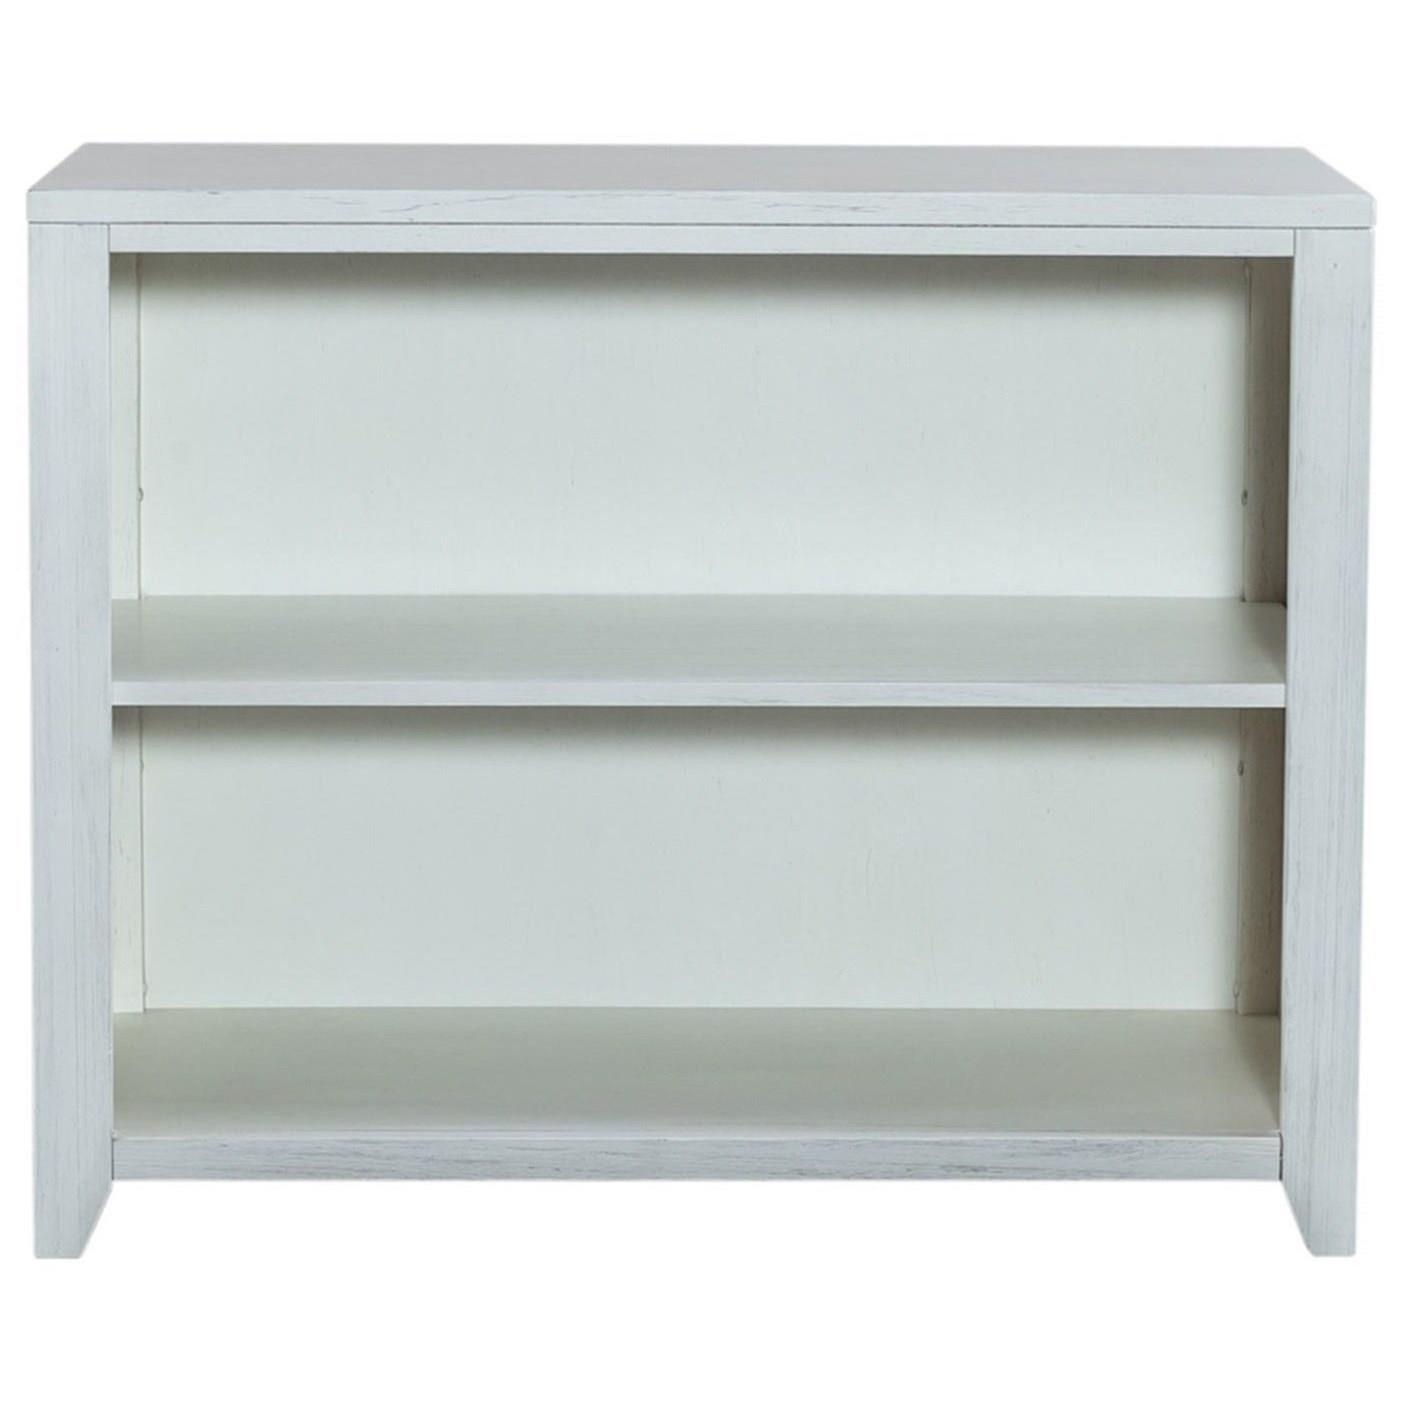 Kid's 2-Shelf Low Bookcase